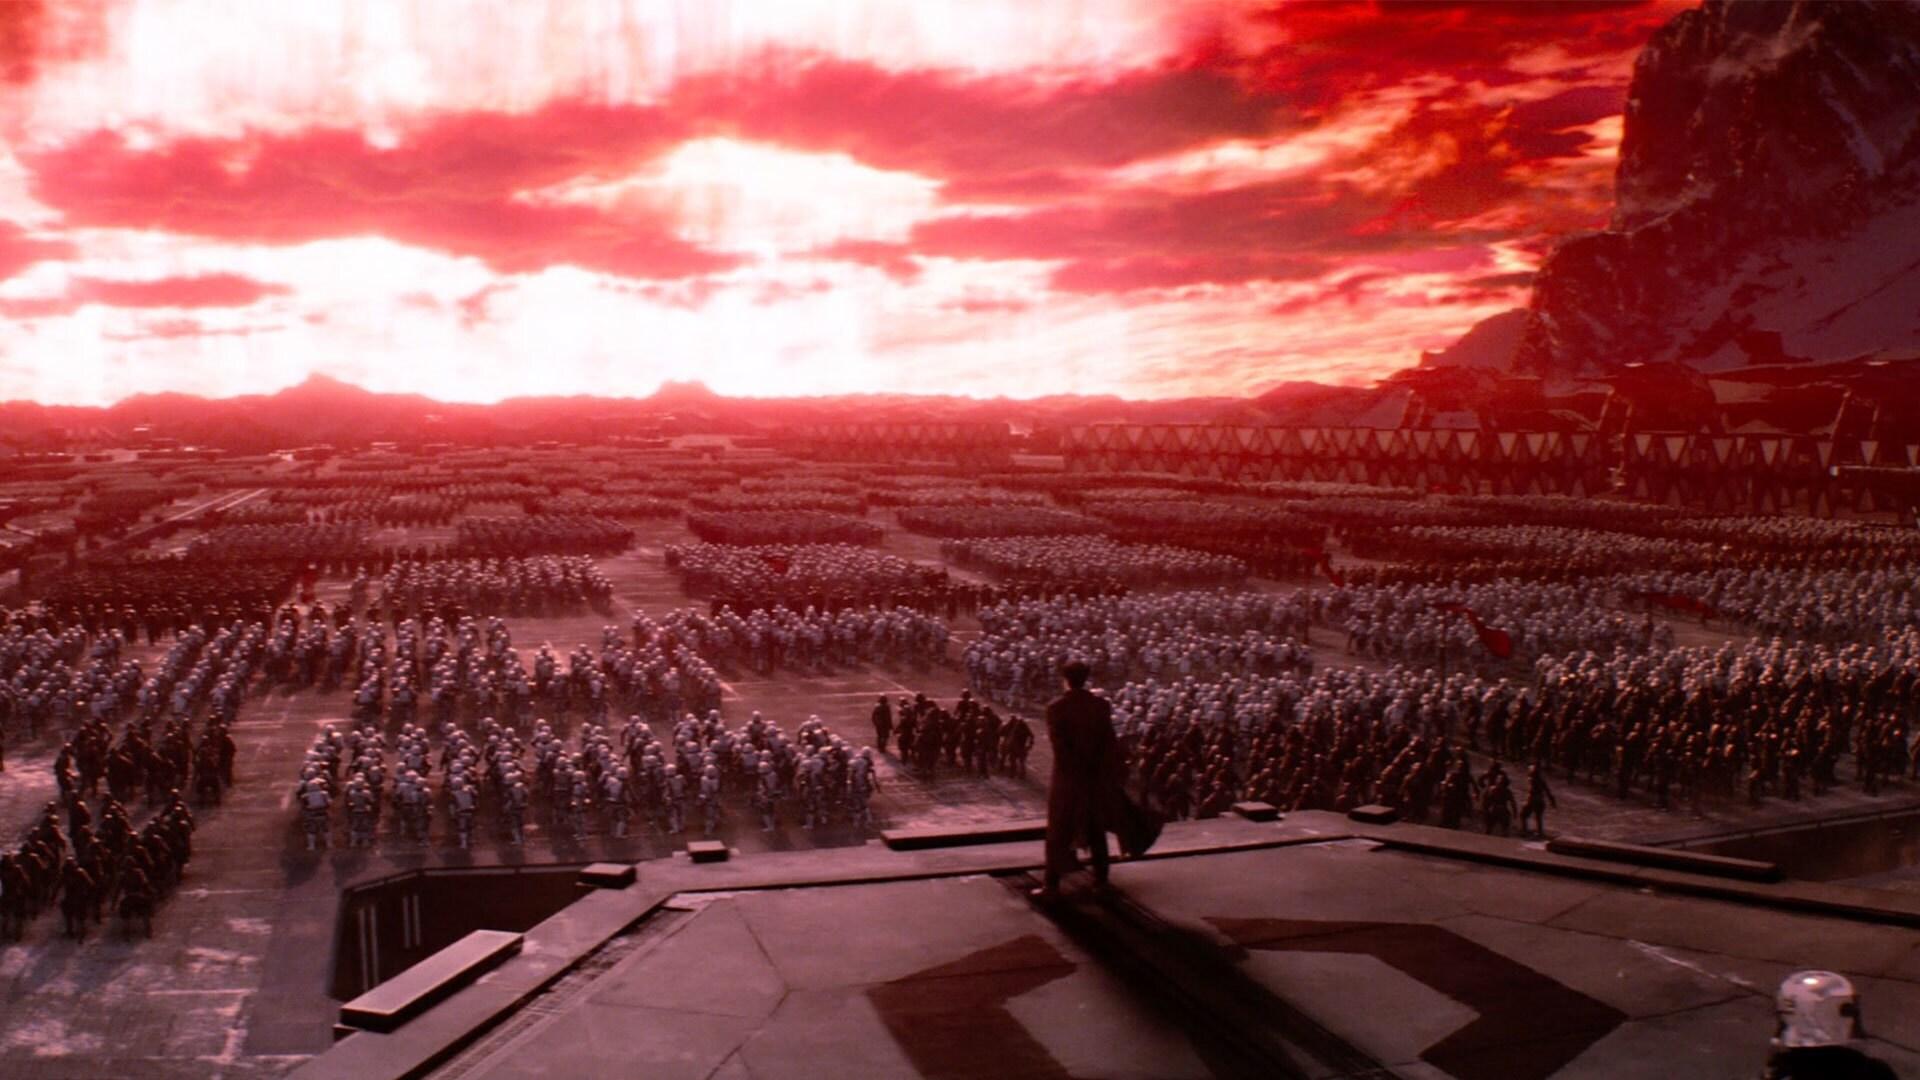 Star Wars: The Force Awakens TV Spot